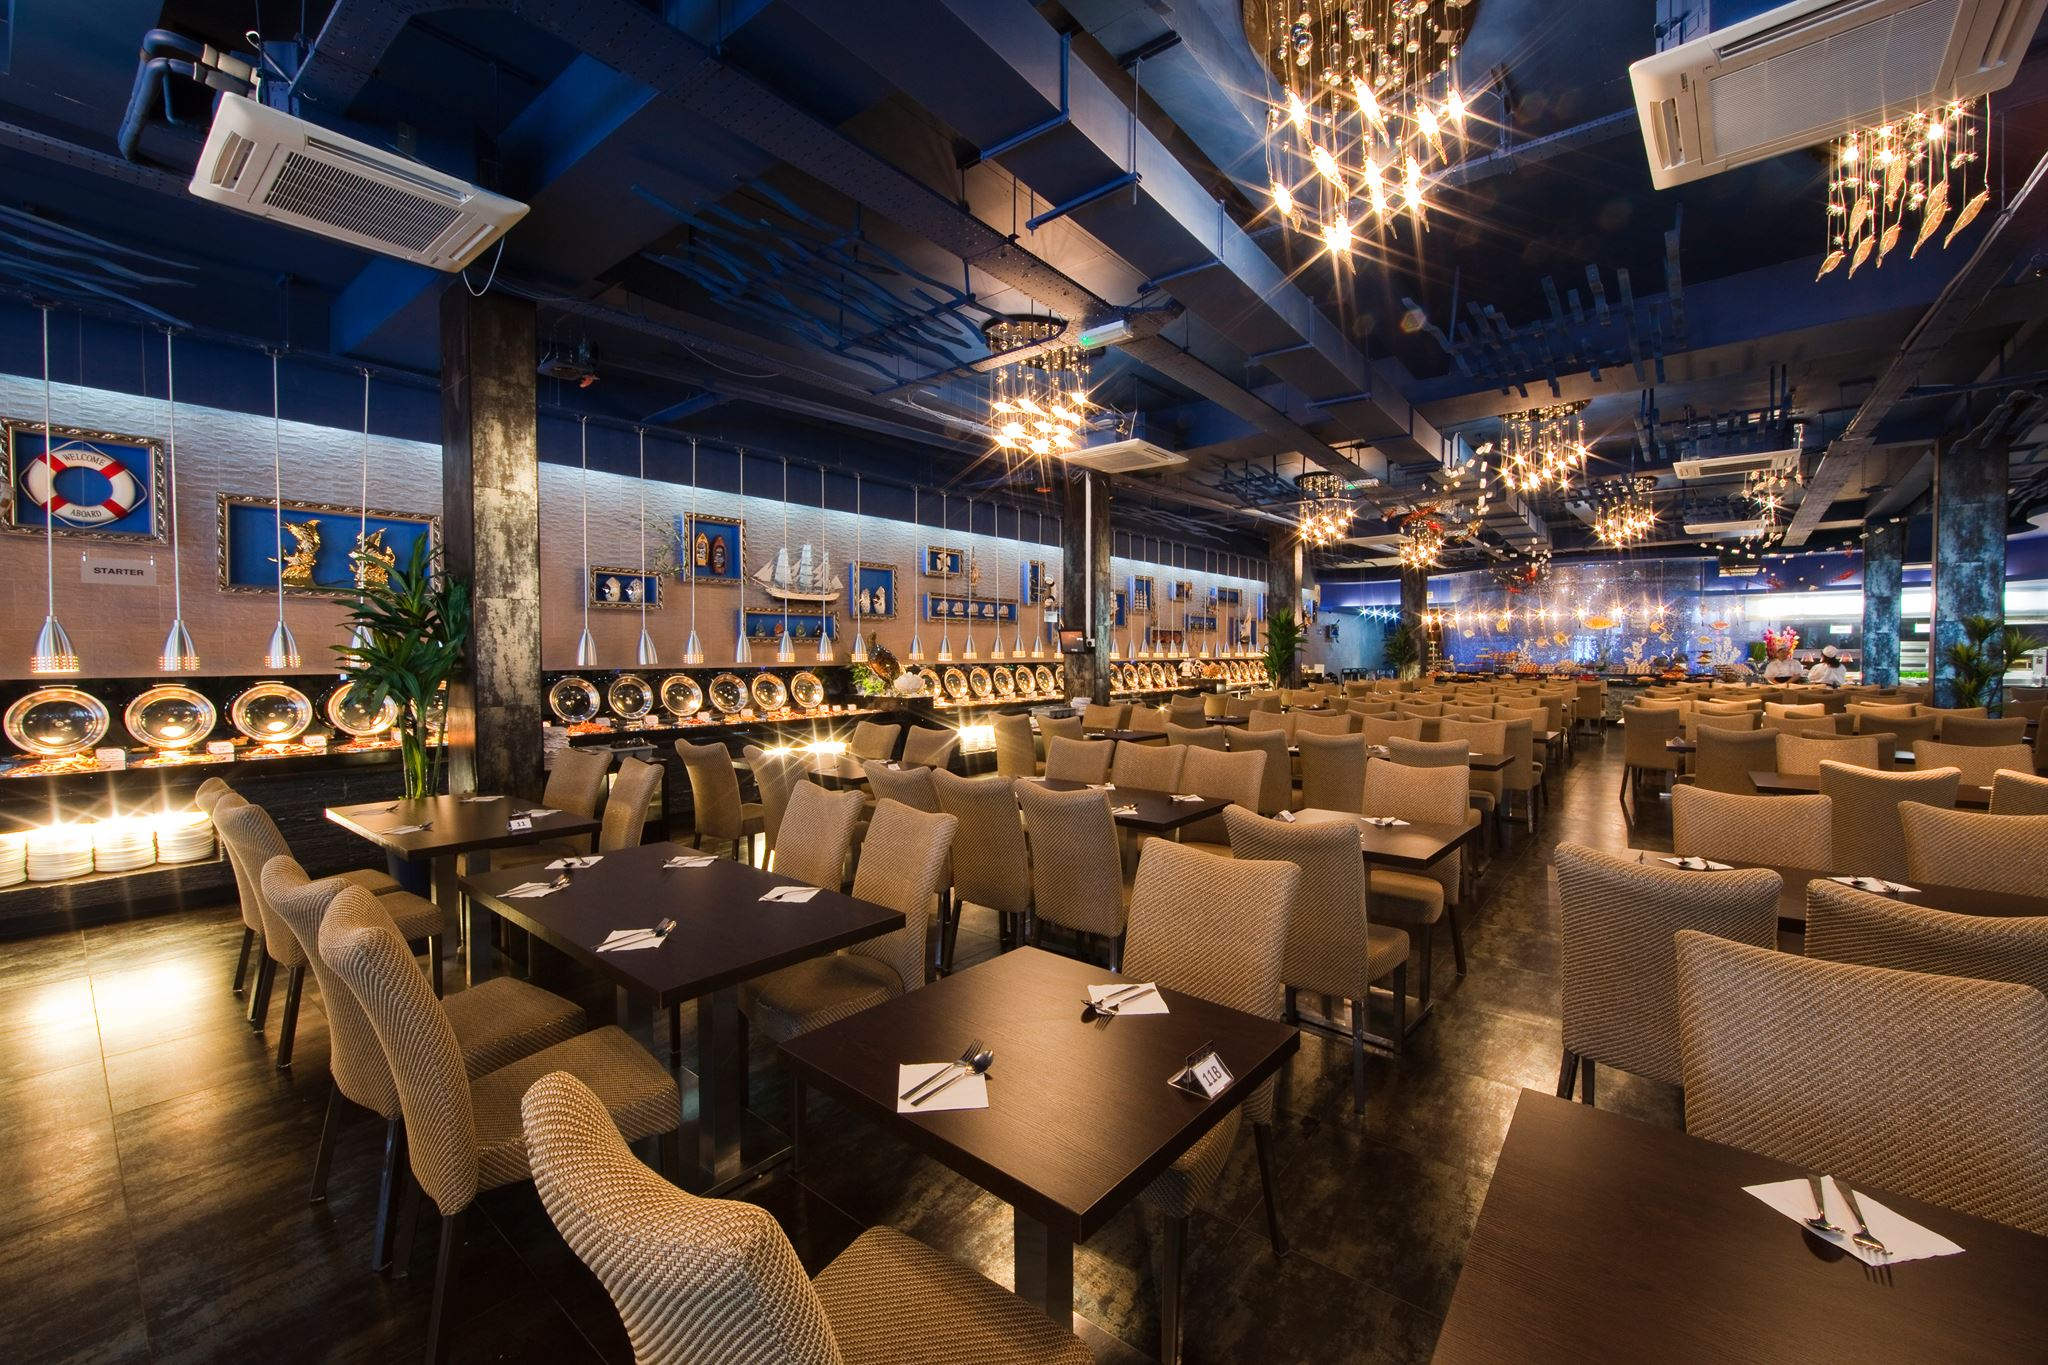 Day's Restaurant